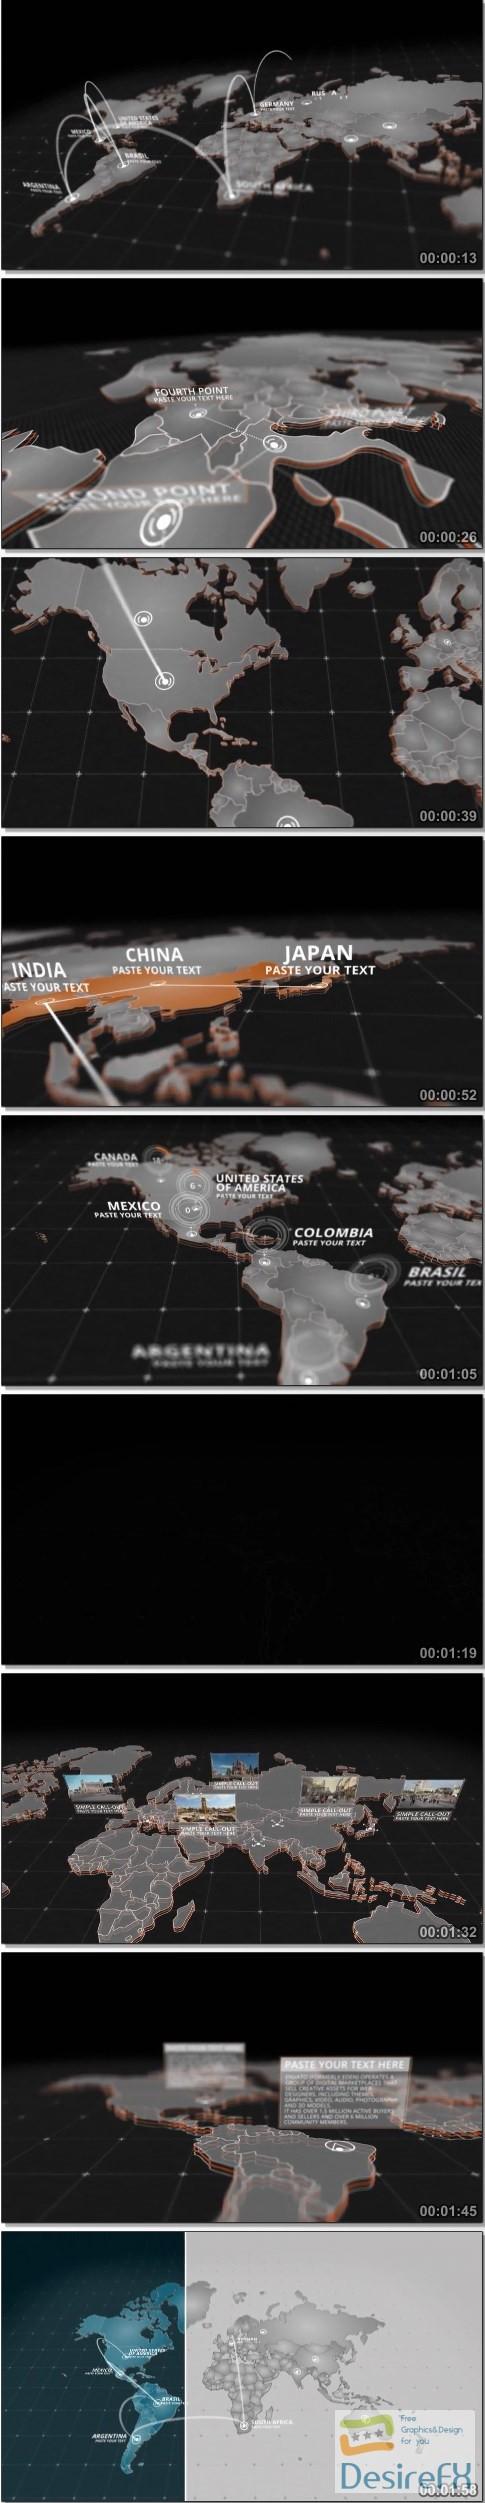 Desirefx download free videohive world map kit 20592273 after effects projects videohive world map kit 20592273 gumiabroncs Gallery